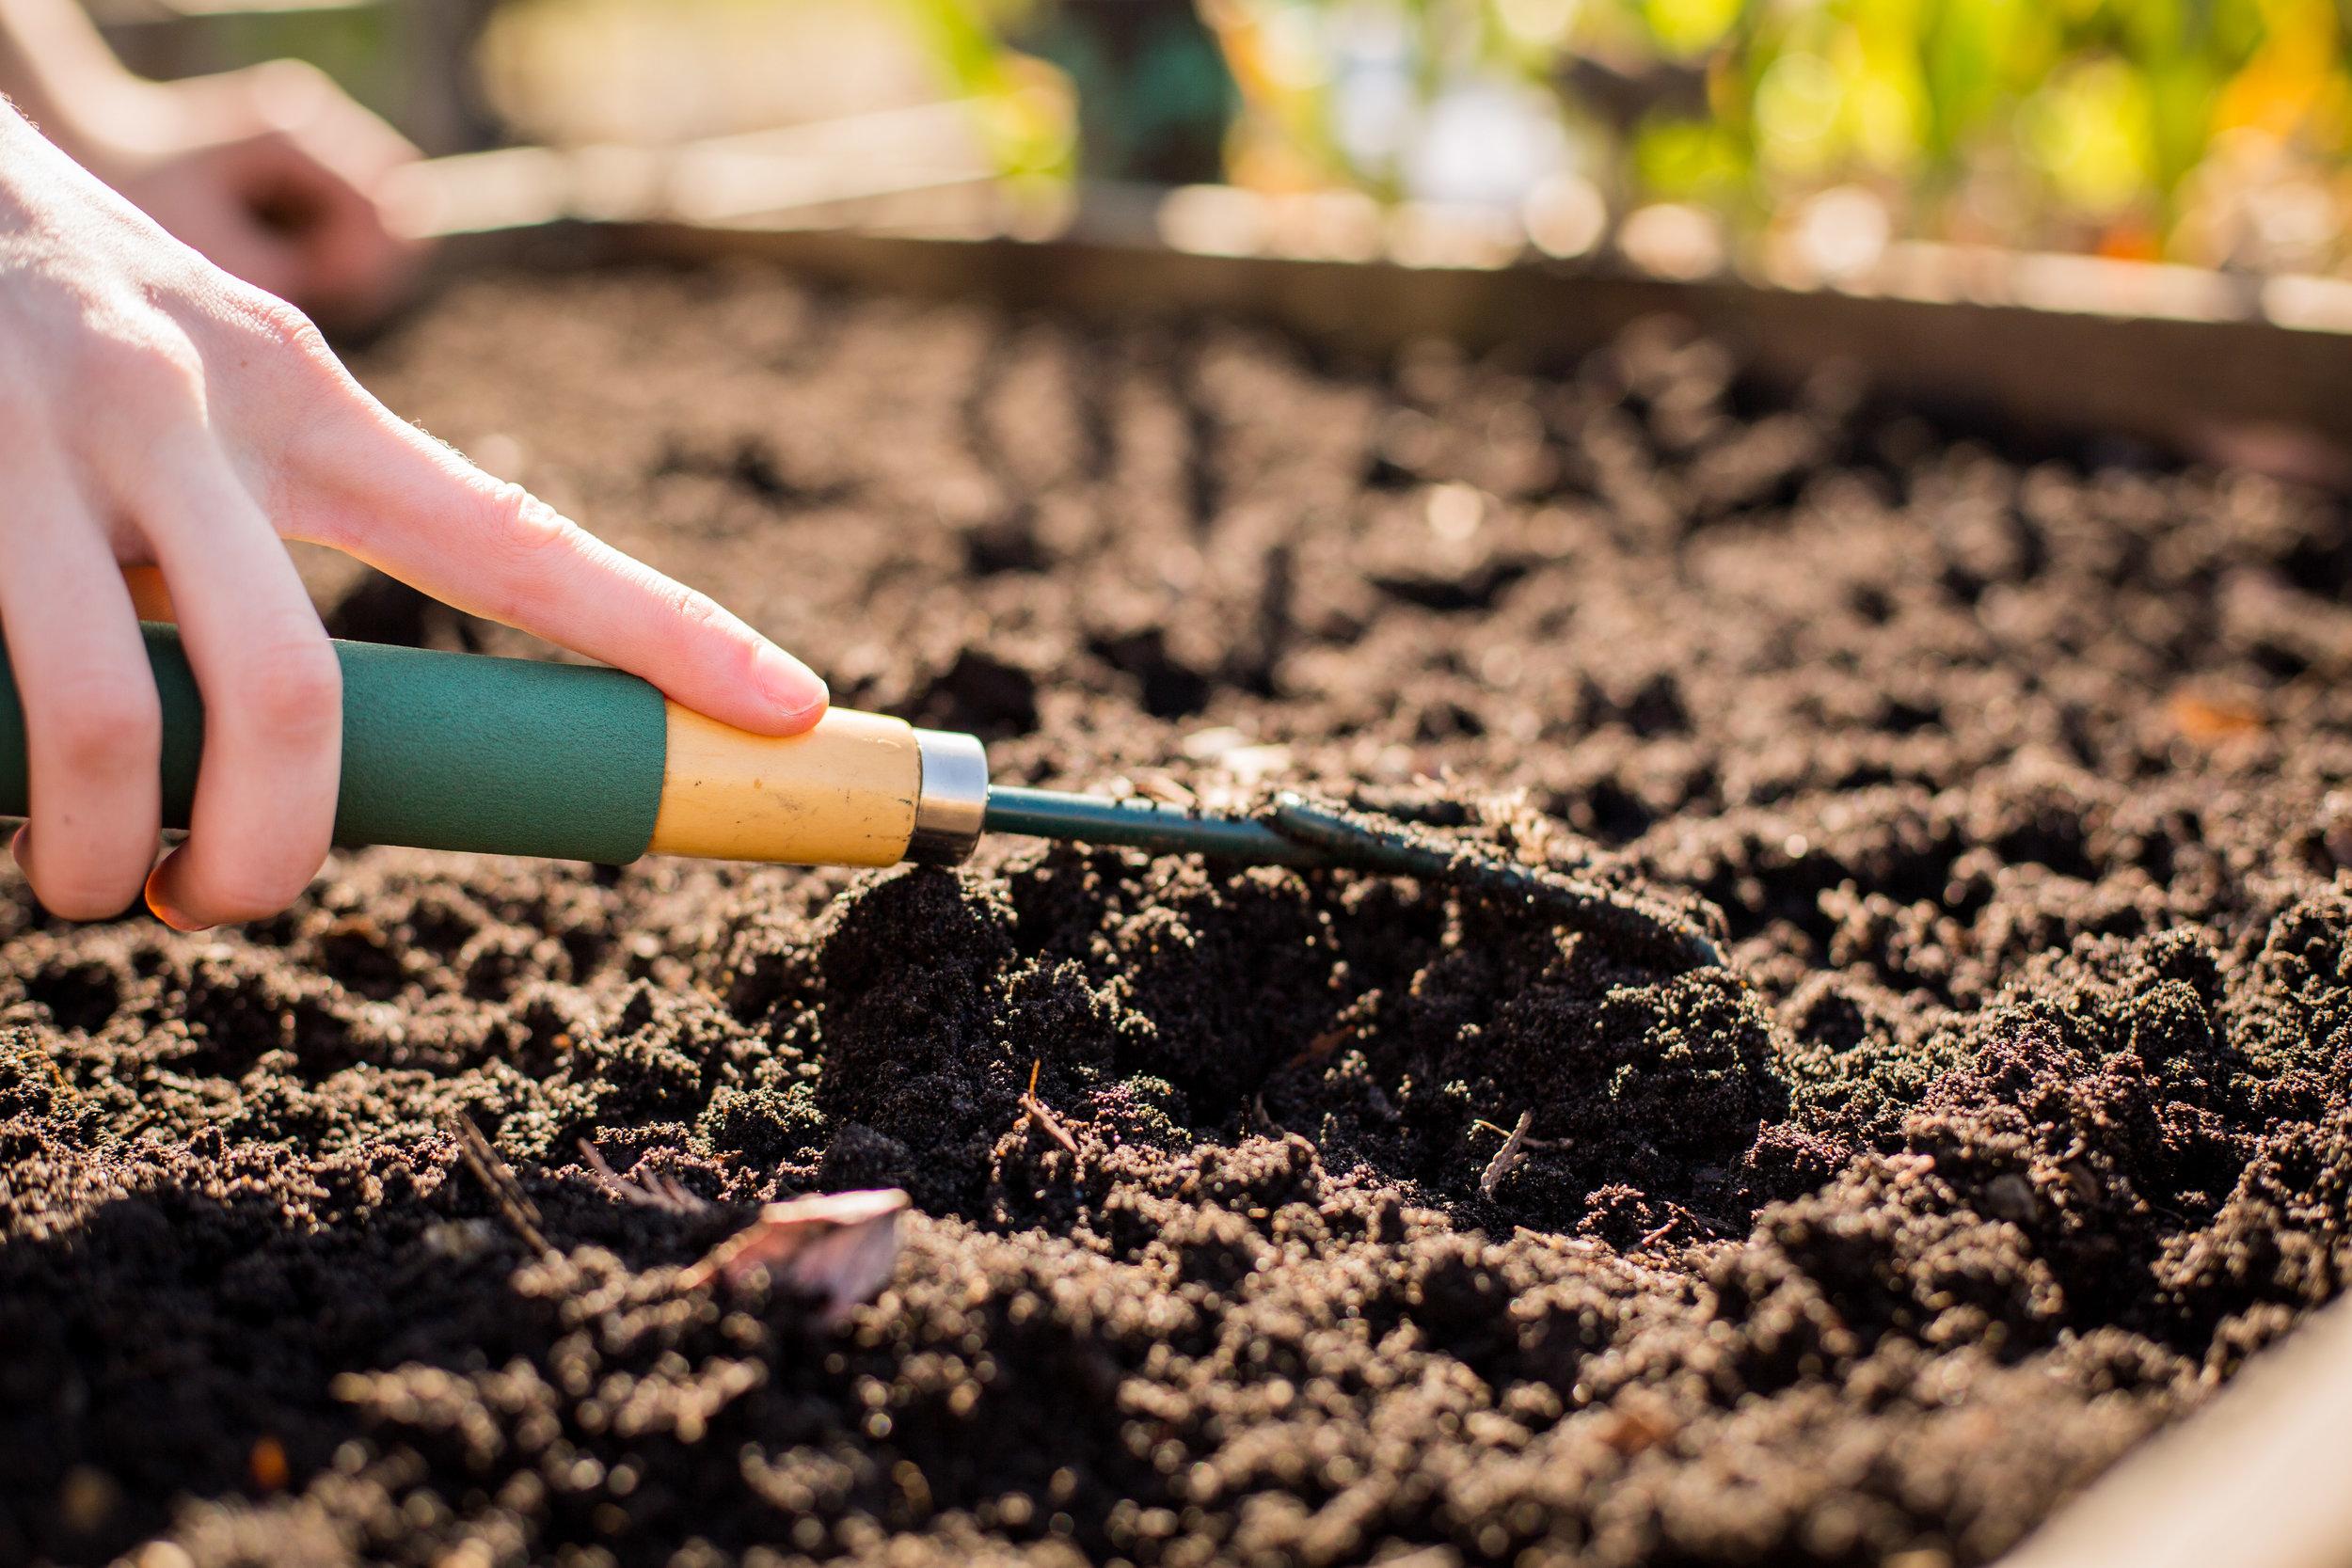 Raised_Garden_Bed_The_Drive_Temporary_Community_Garden_04.2016_Shifting_Growth_048.jpg